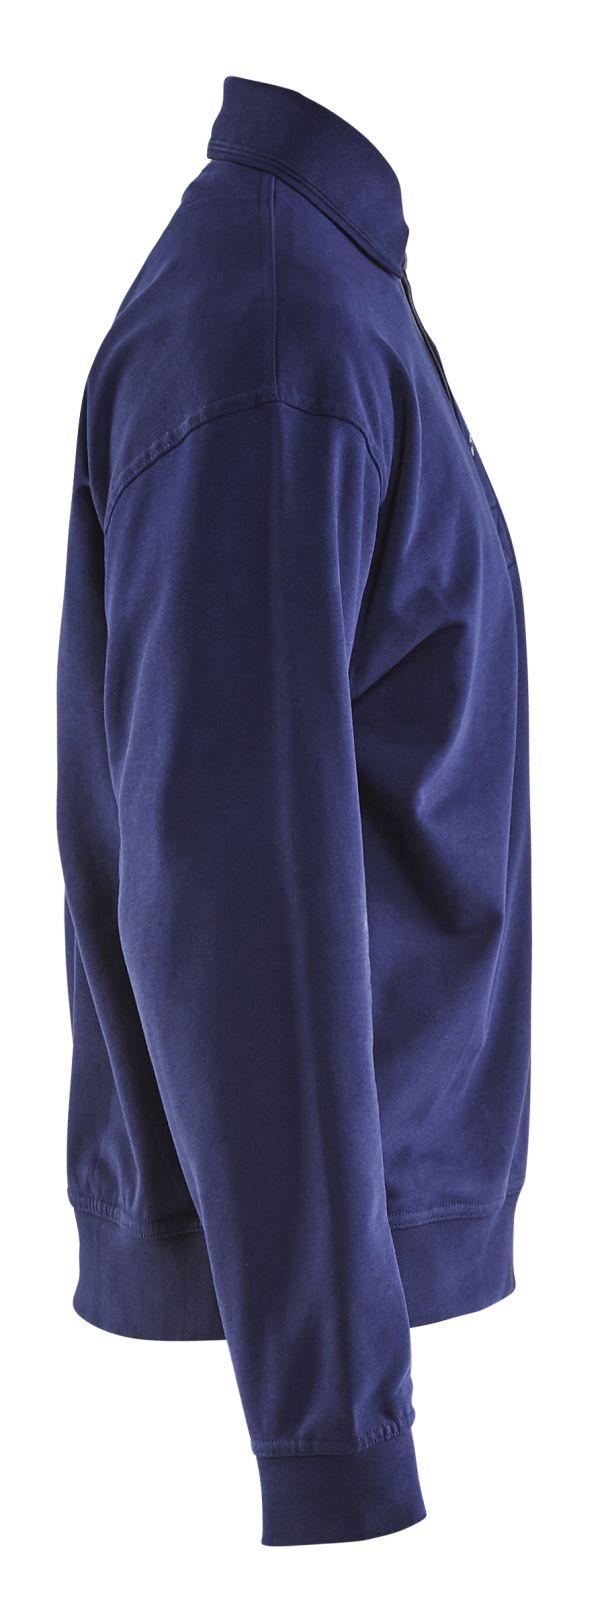 Blaklader Polo sweatshirts 33701158 marineblauw(8900)